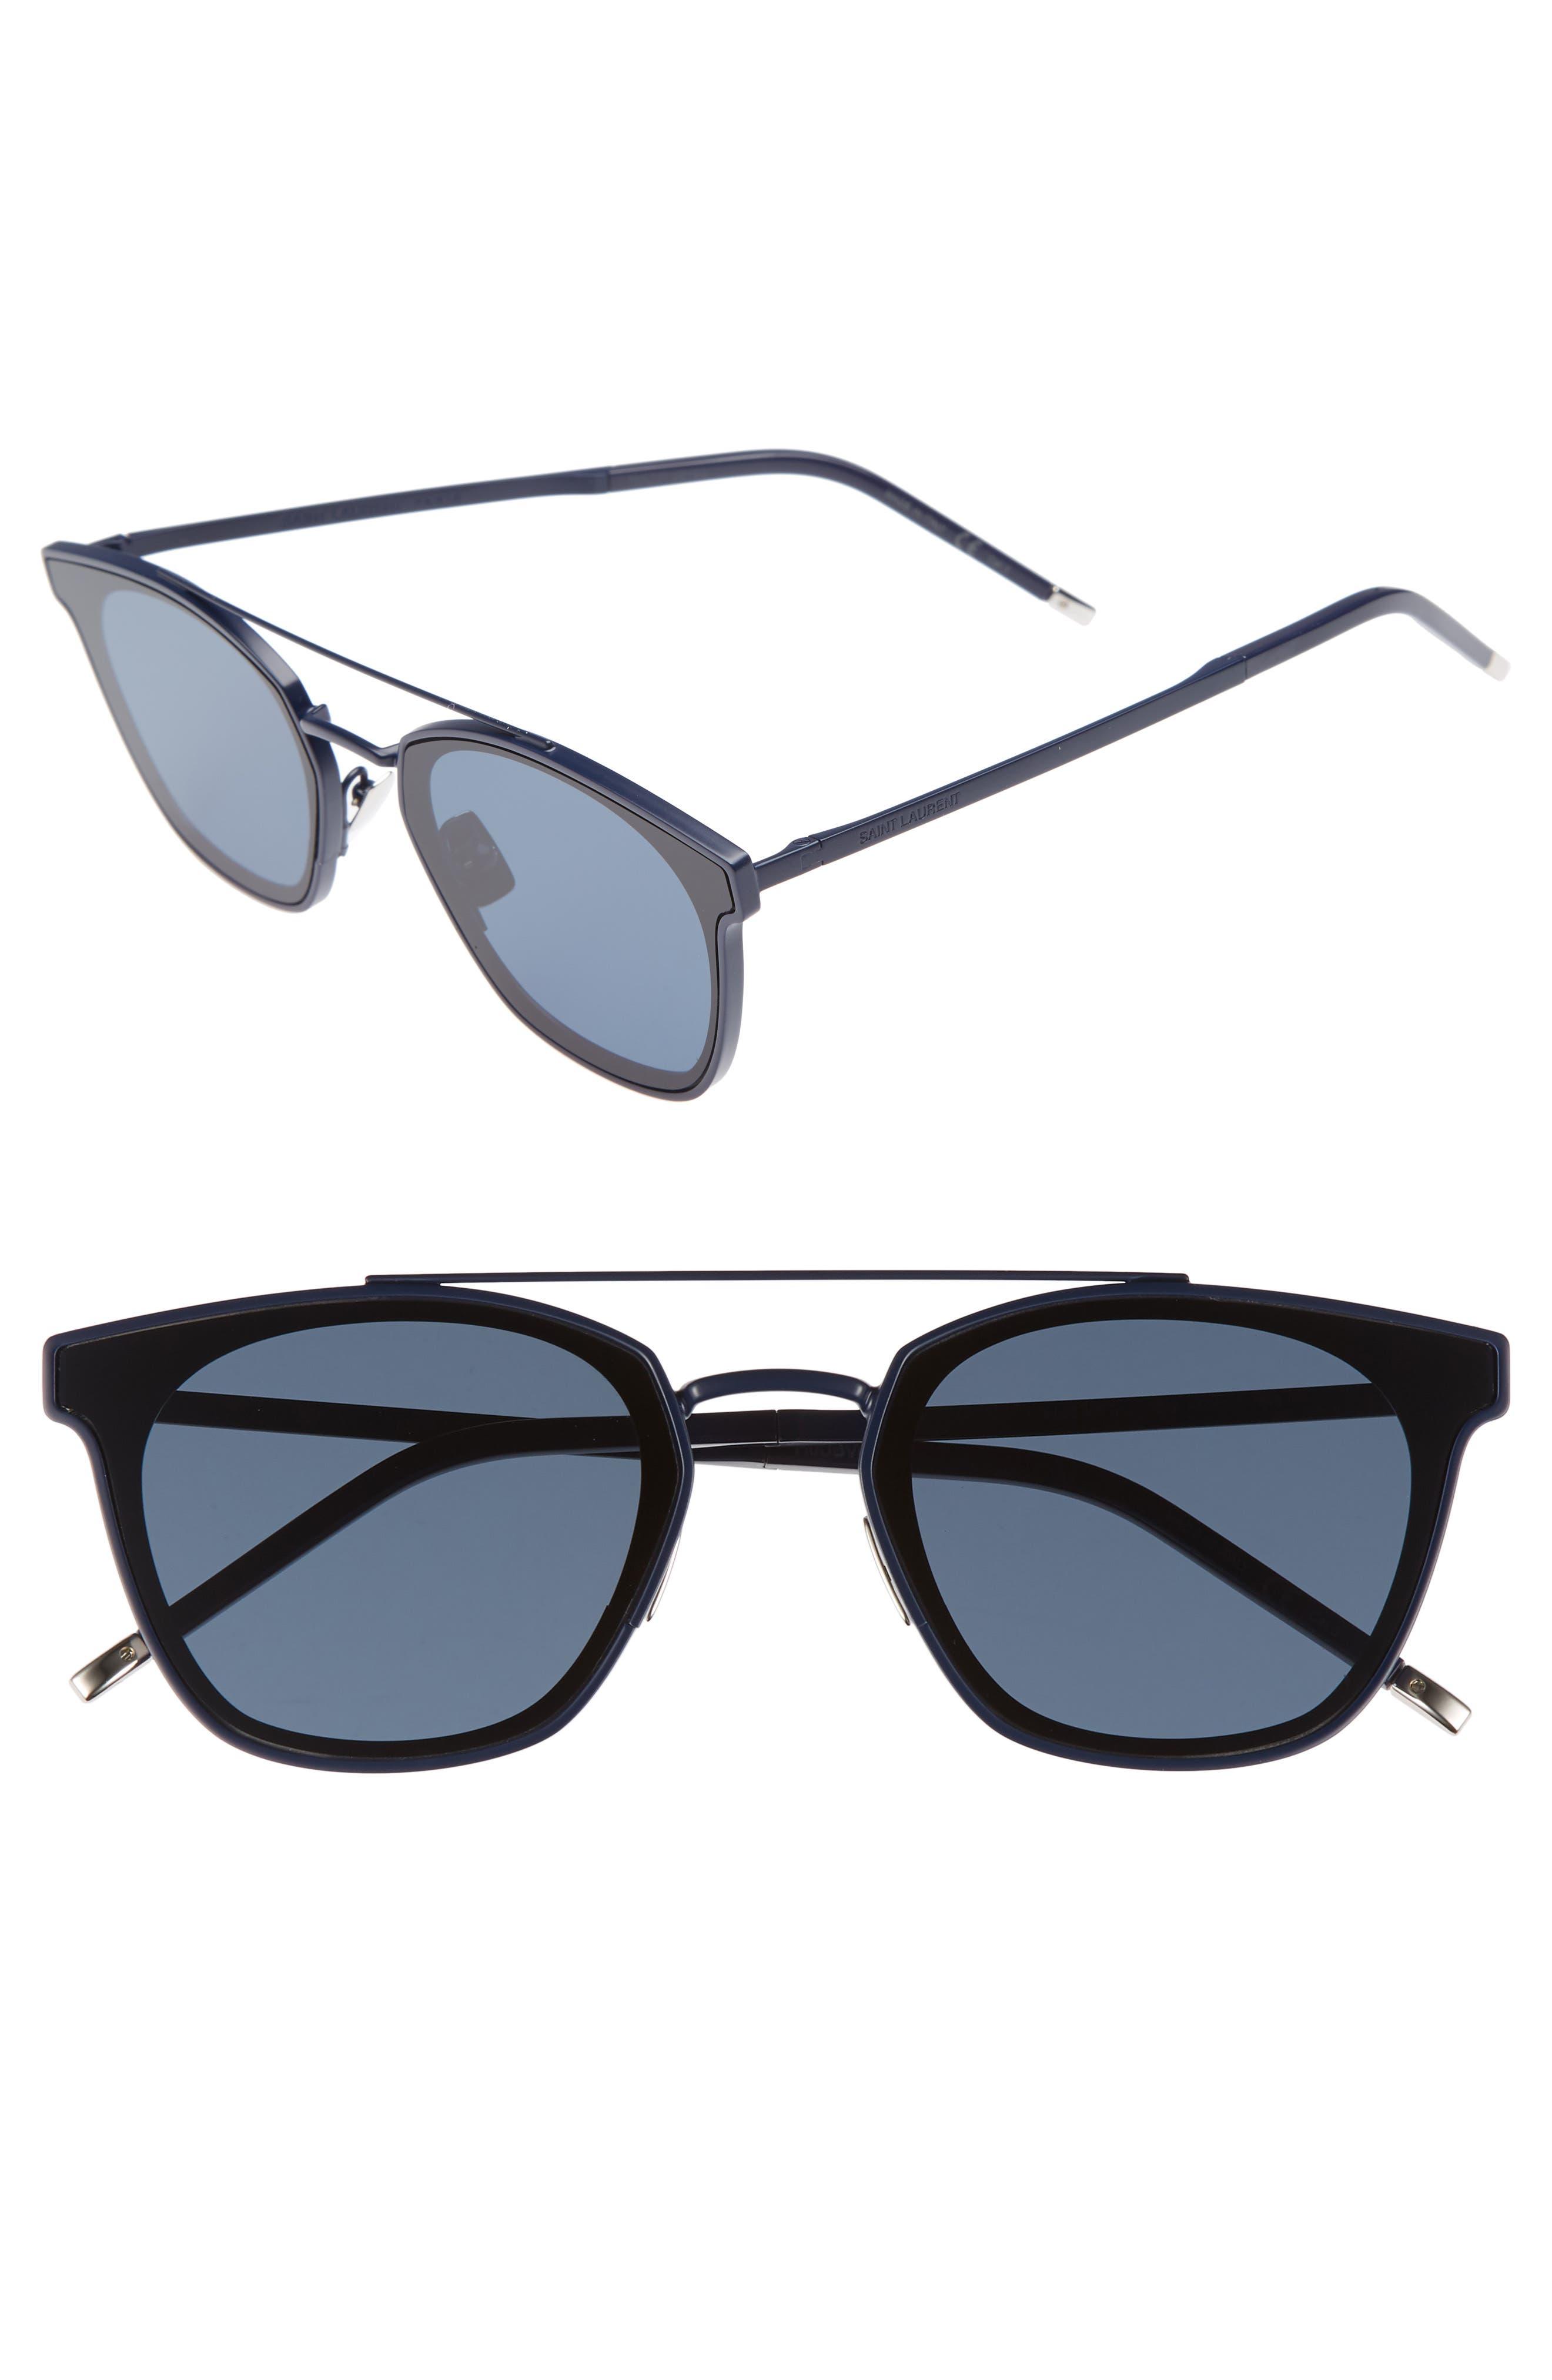 SL 28 61mm Polarized Sunglasses,                             Main thumbnail 1, color,                             BLUE